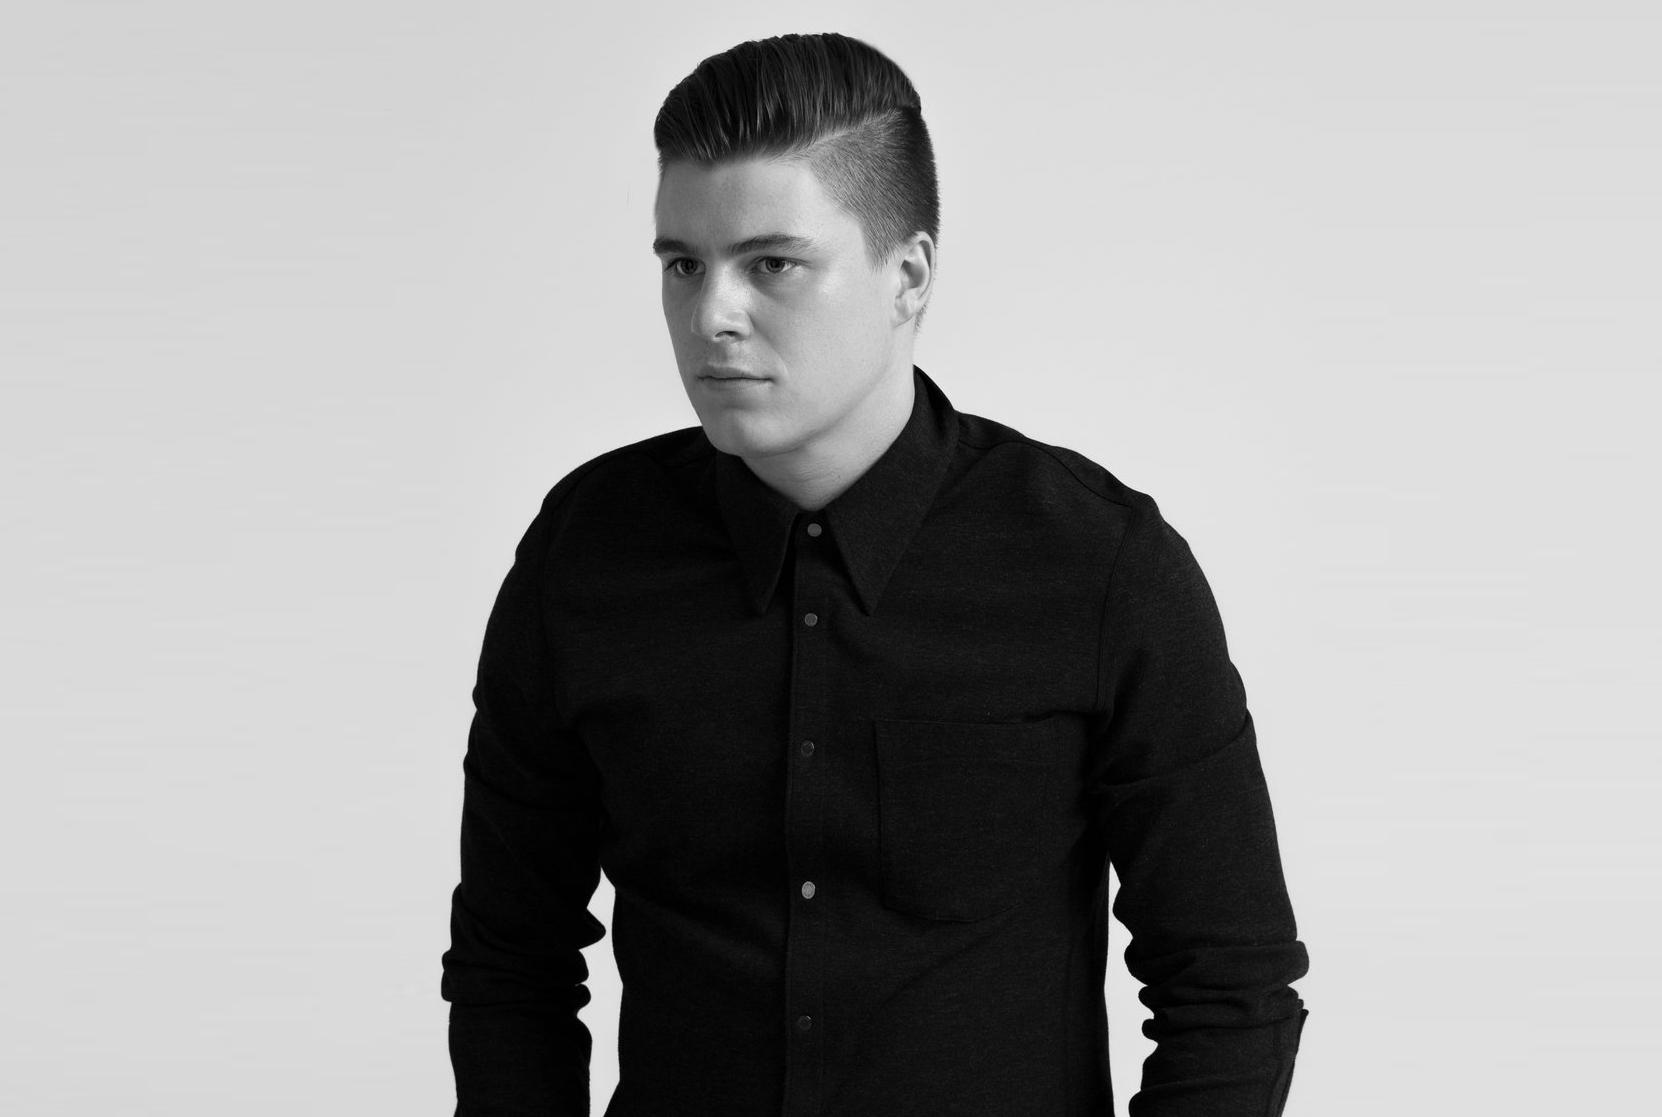 Dylan Maranda